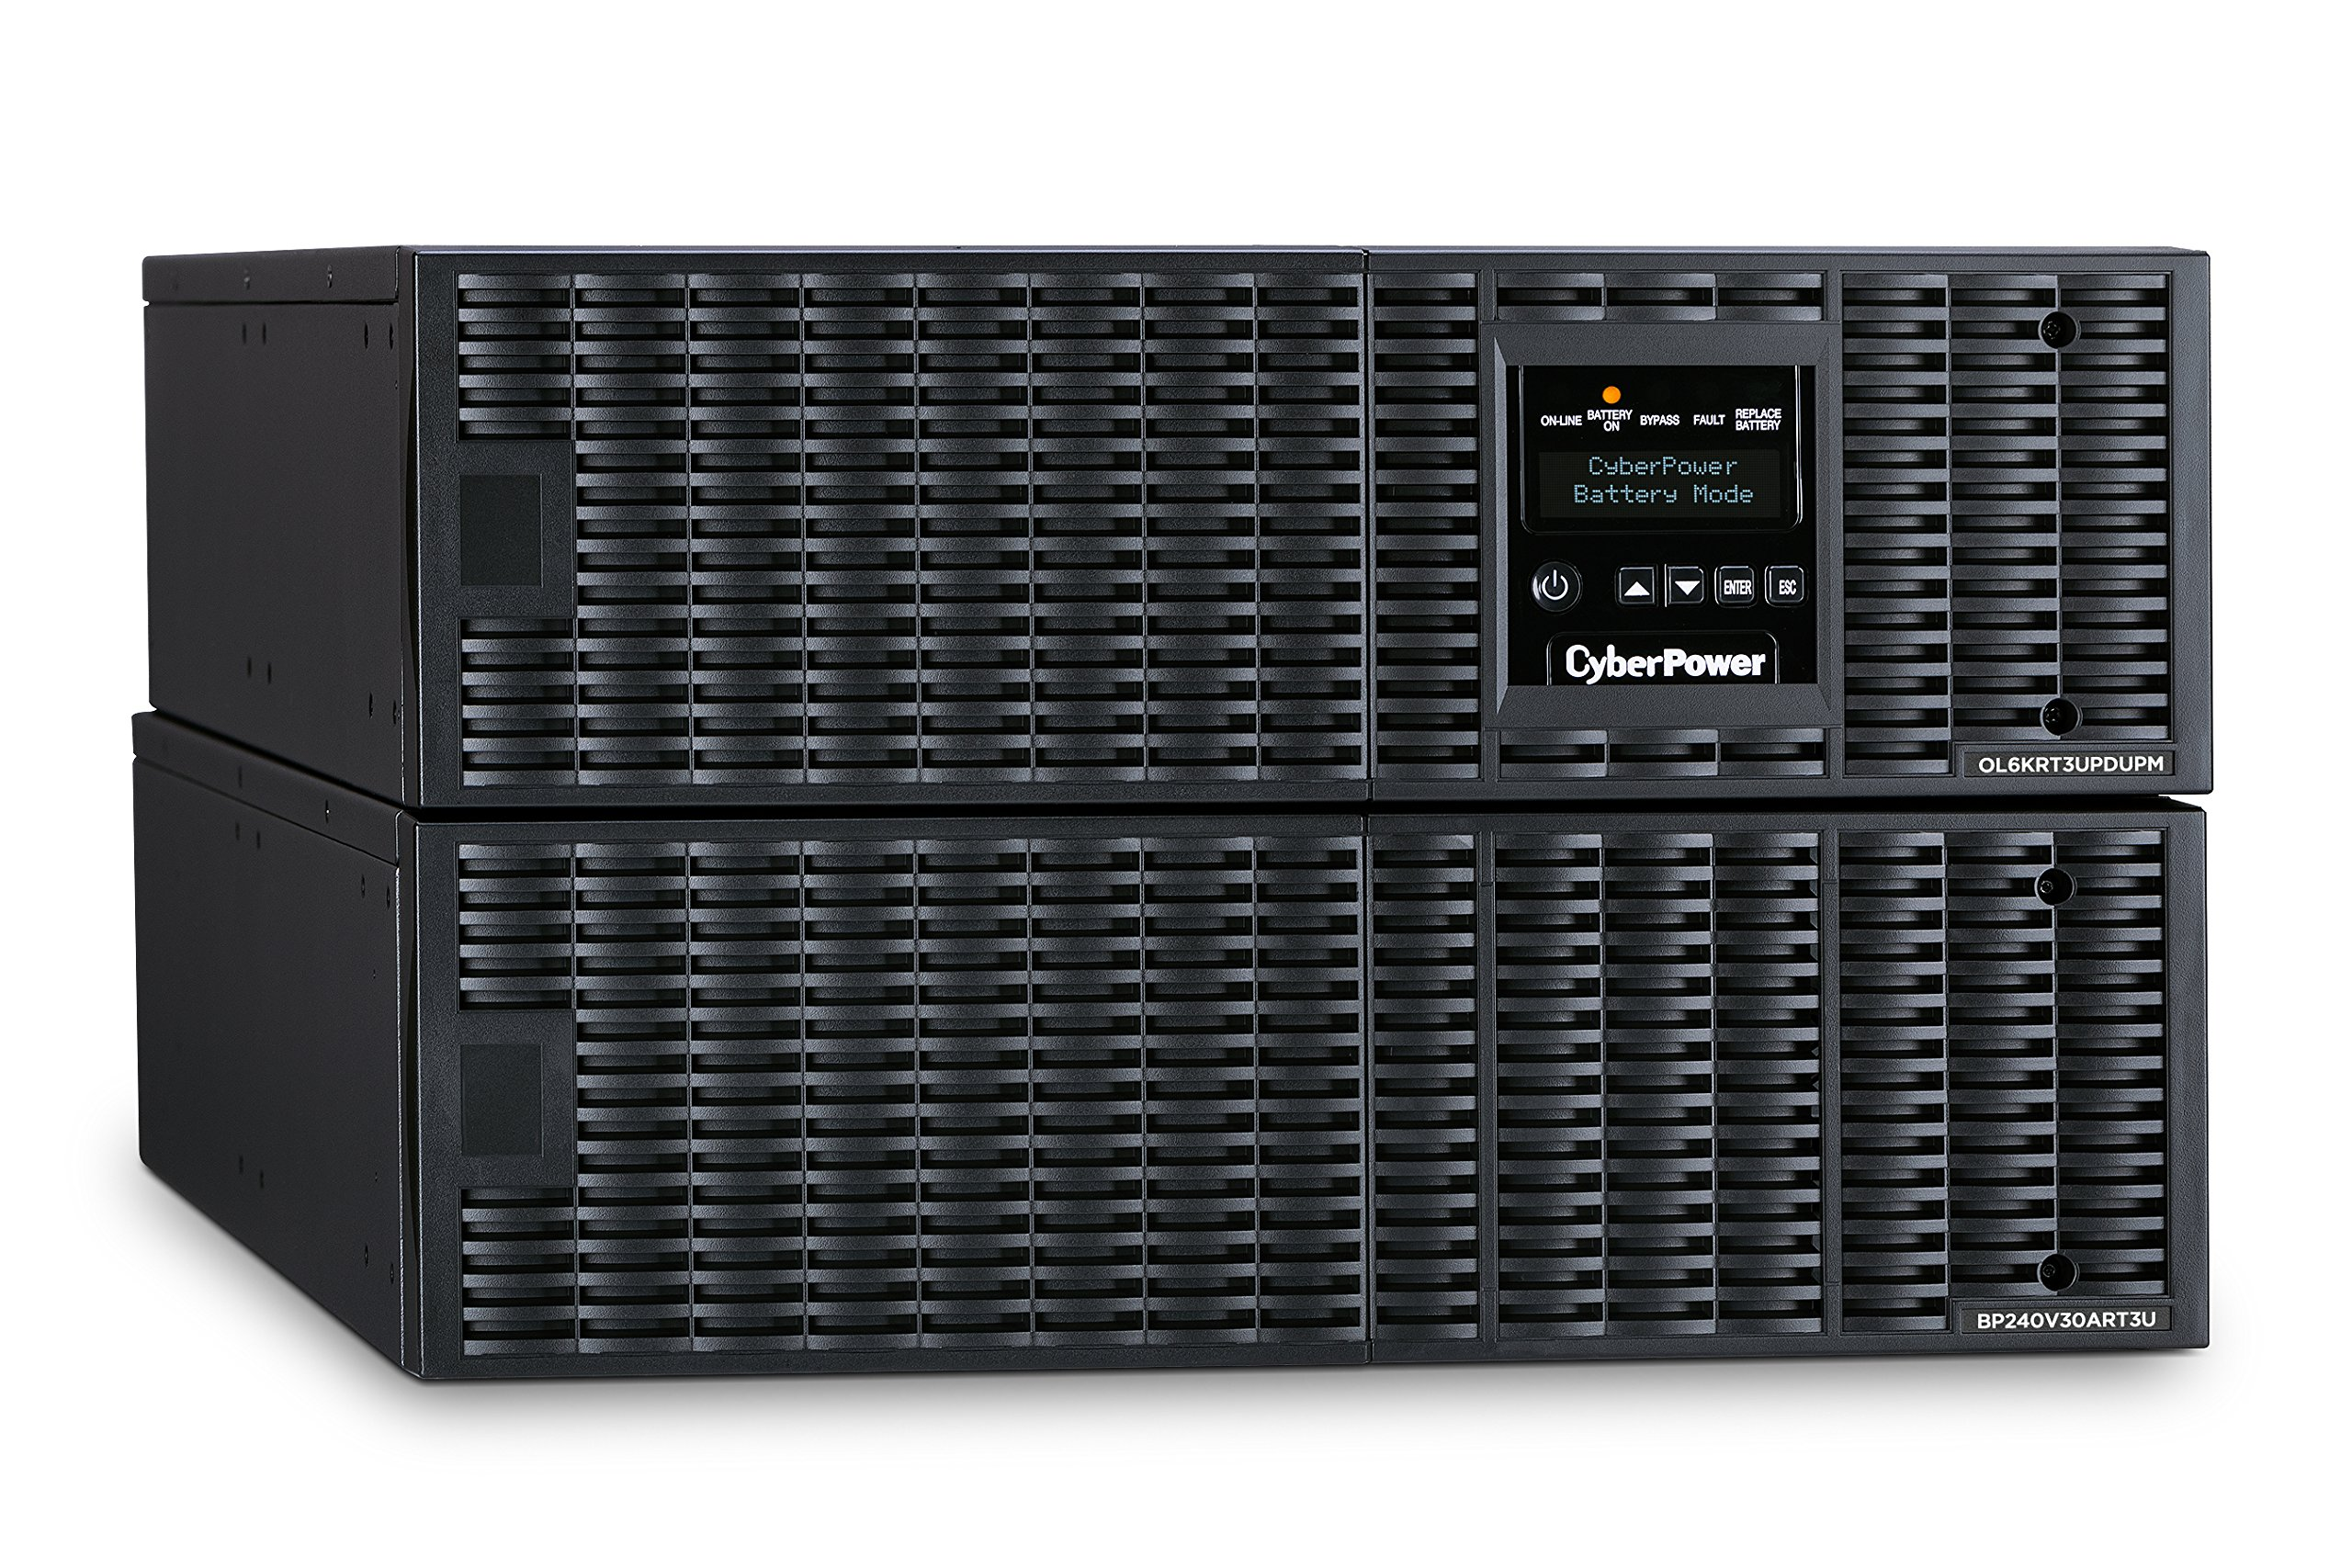 CyberPower OL6KRT3UHW Smart App Online UPS System, 6000VA/5400W, 1 Outlet, 6U Rack/Tower